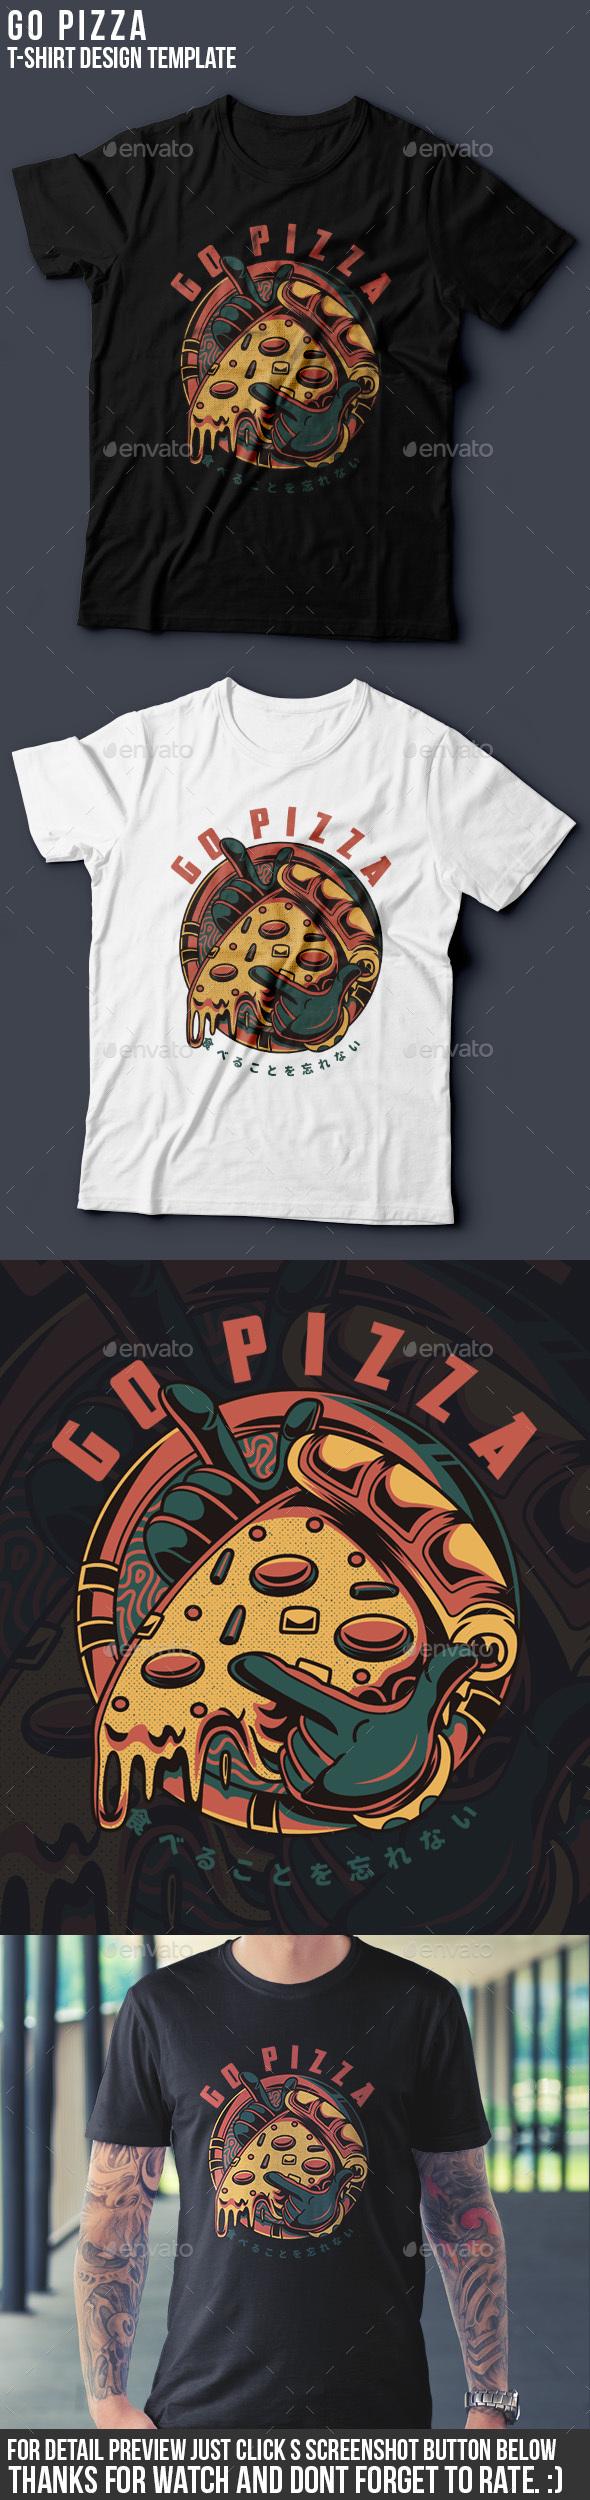 Go Pizza T-Shirt Design - Business T-Shirts